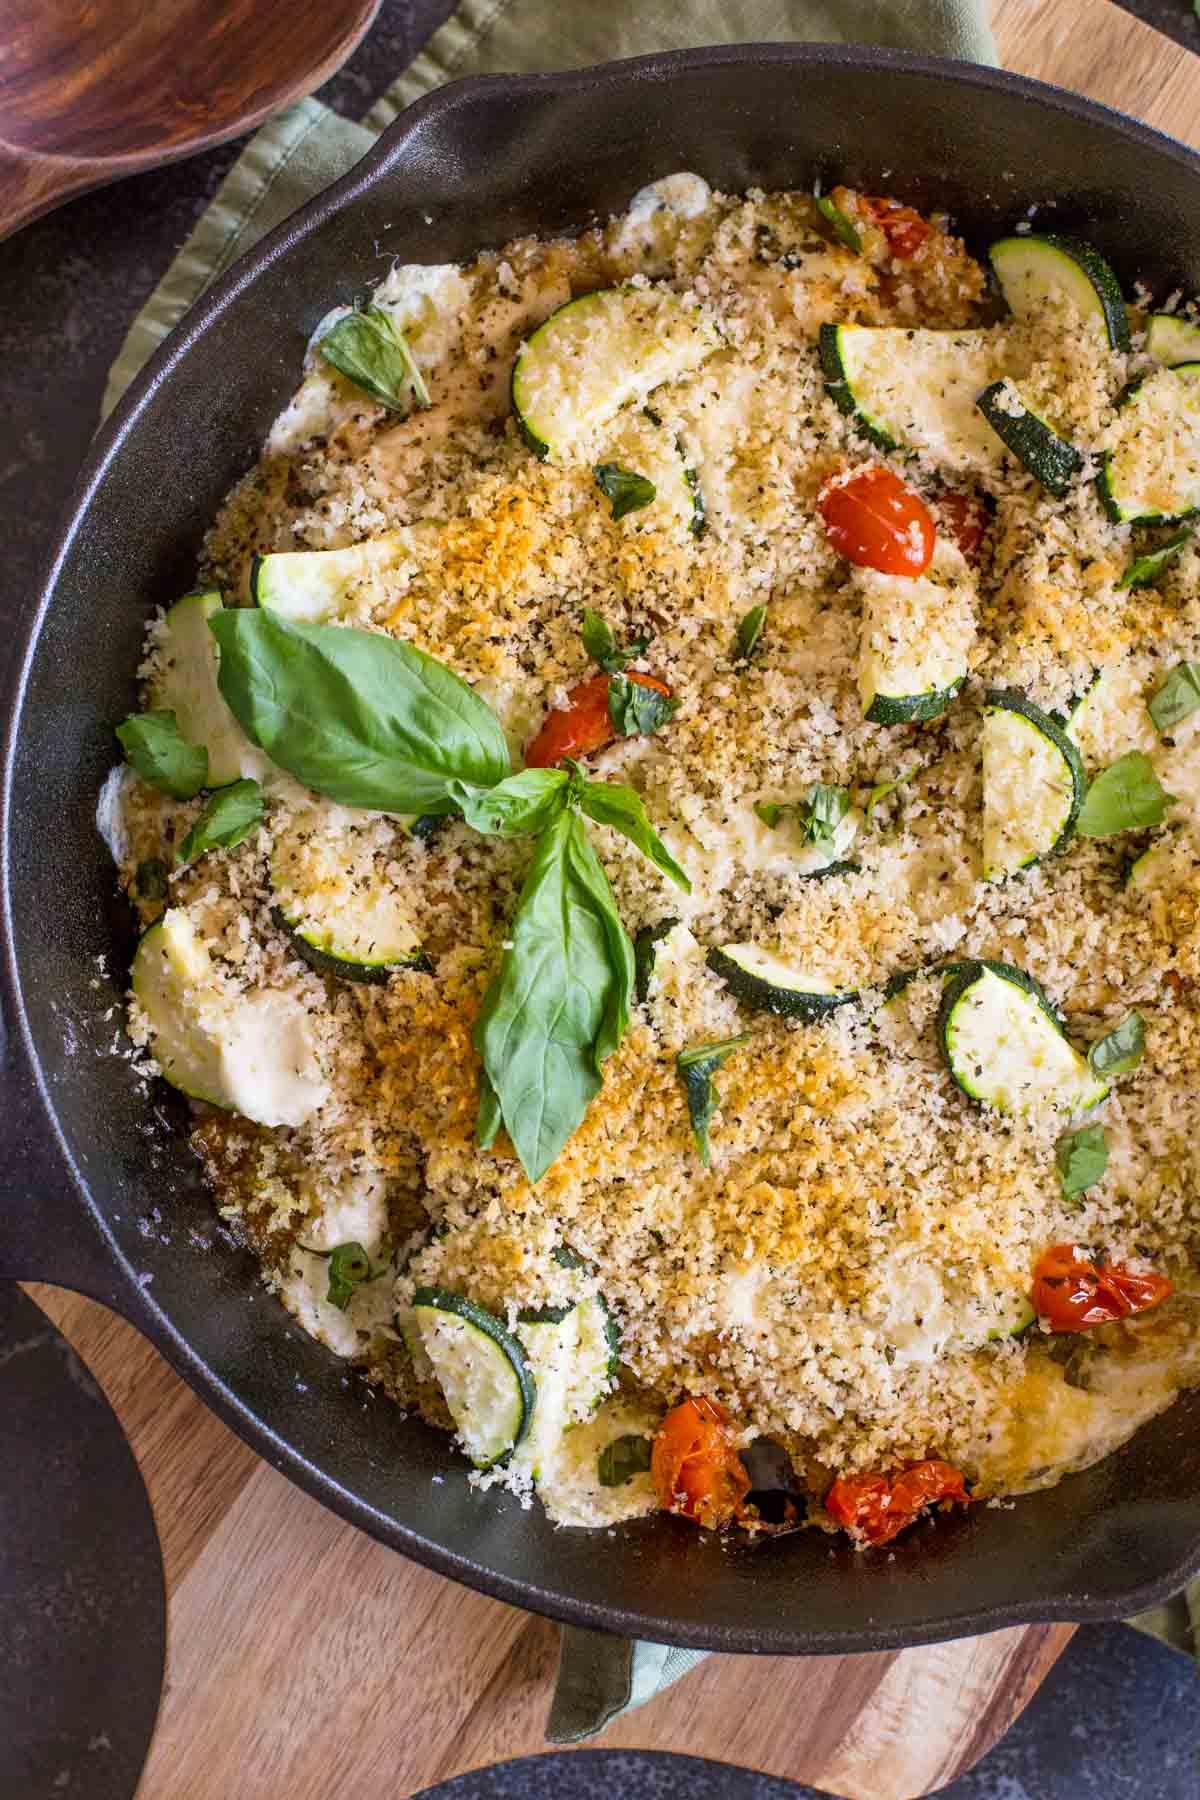 Pesto Chicken Skillet garnished with some fresh basil.